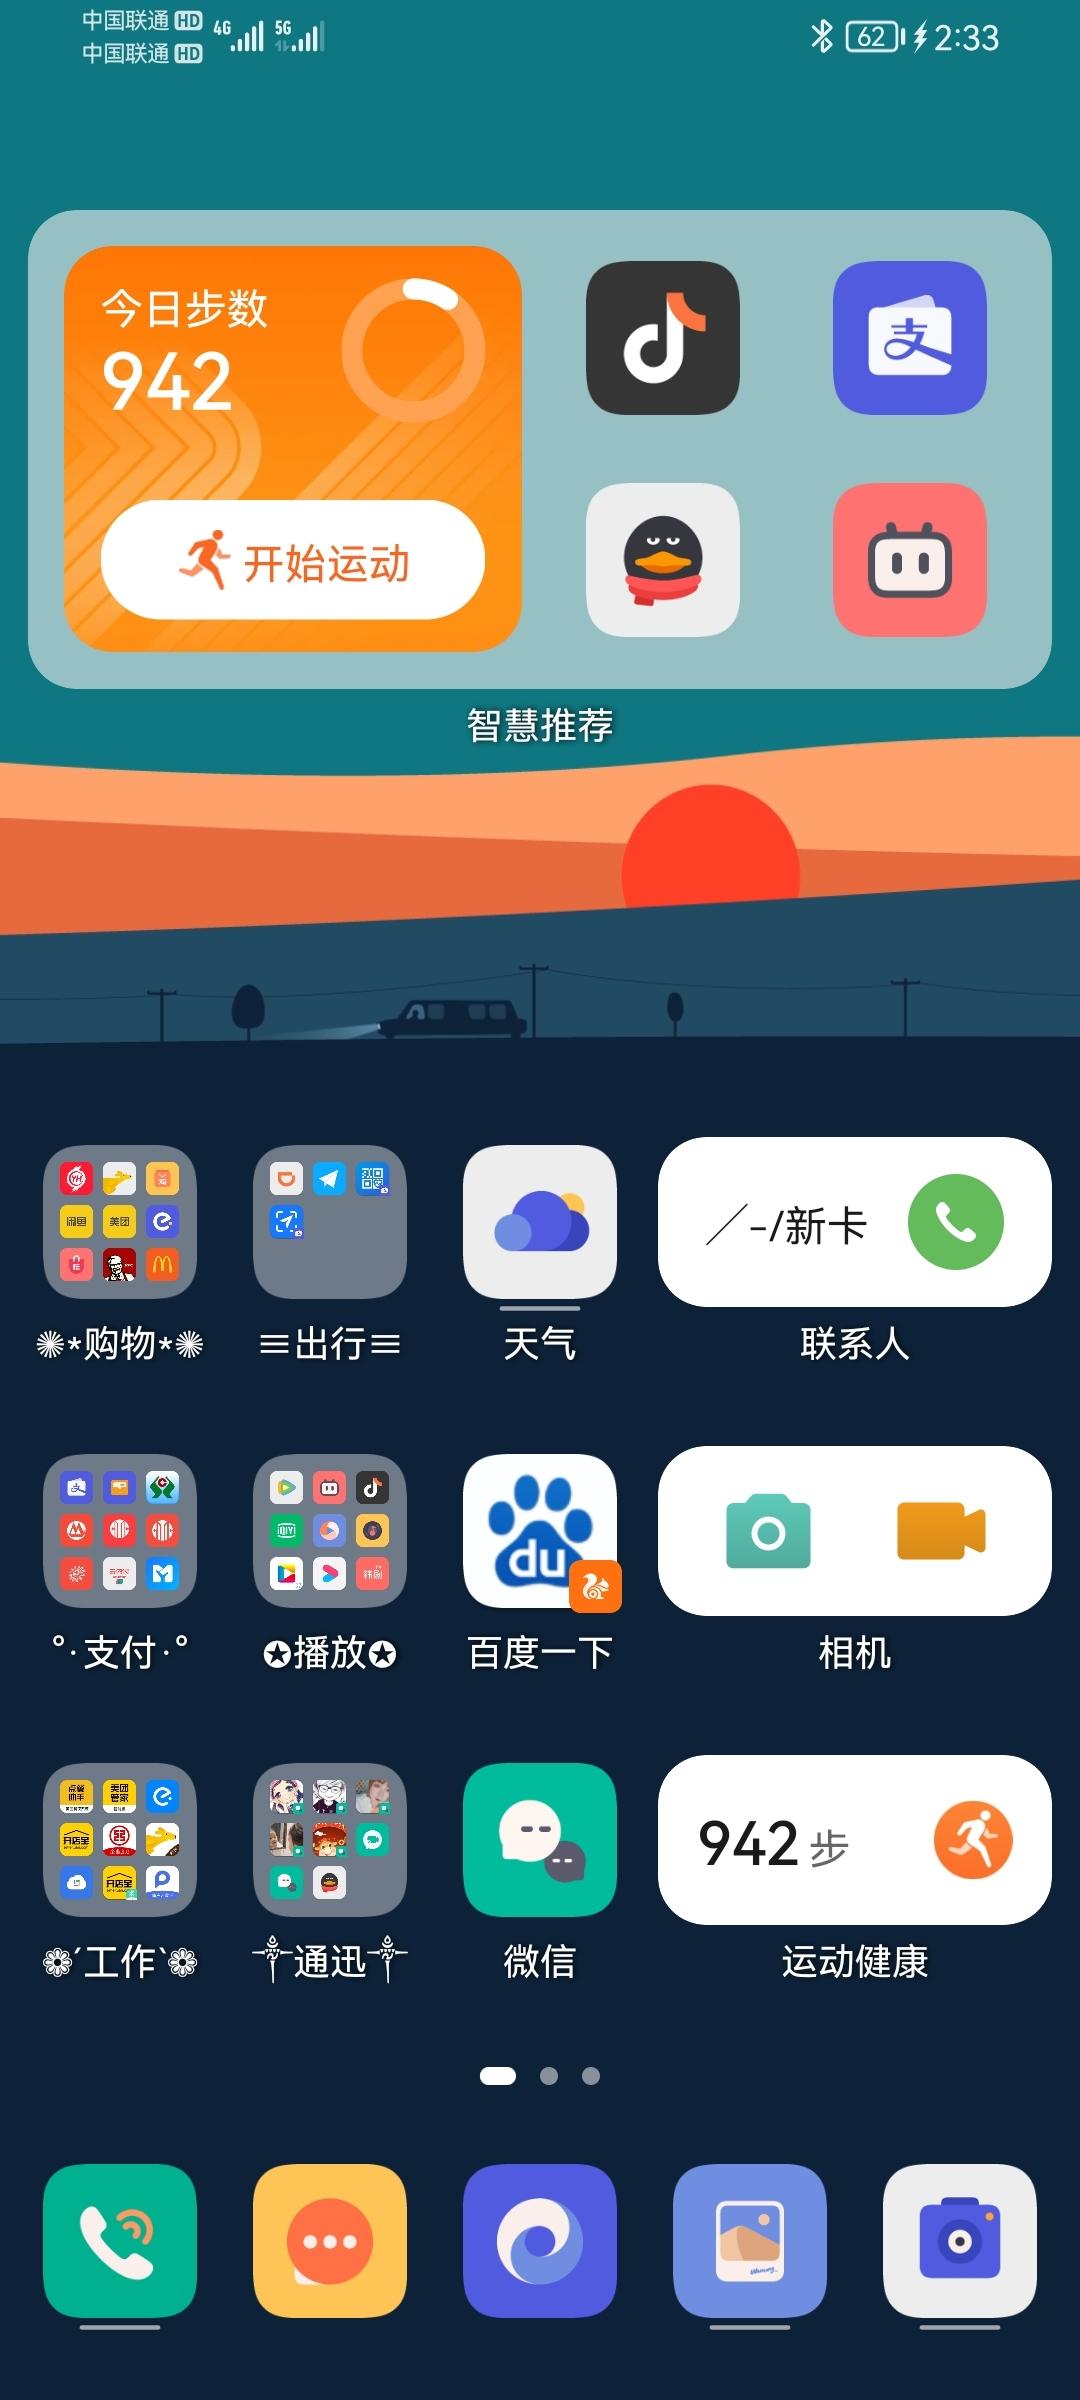 Screenshot_20210803_023346_com.huawei.android.internal.app.jpg